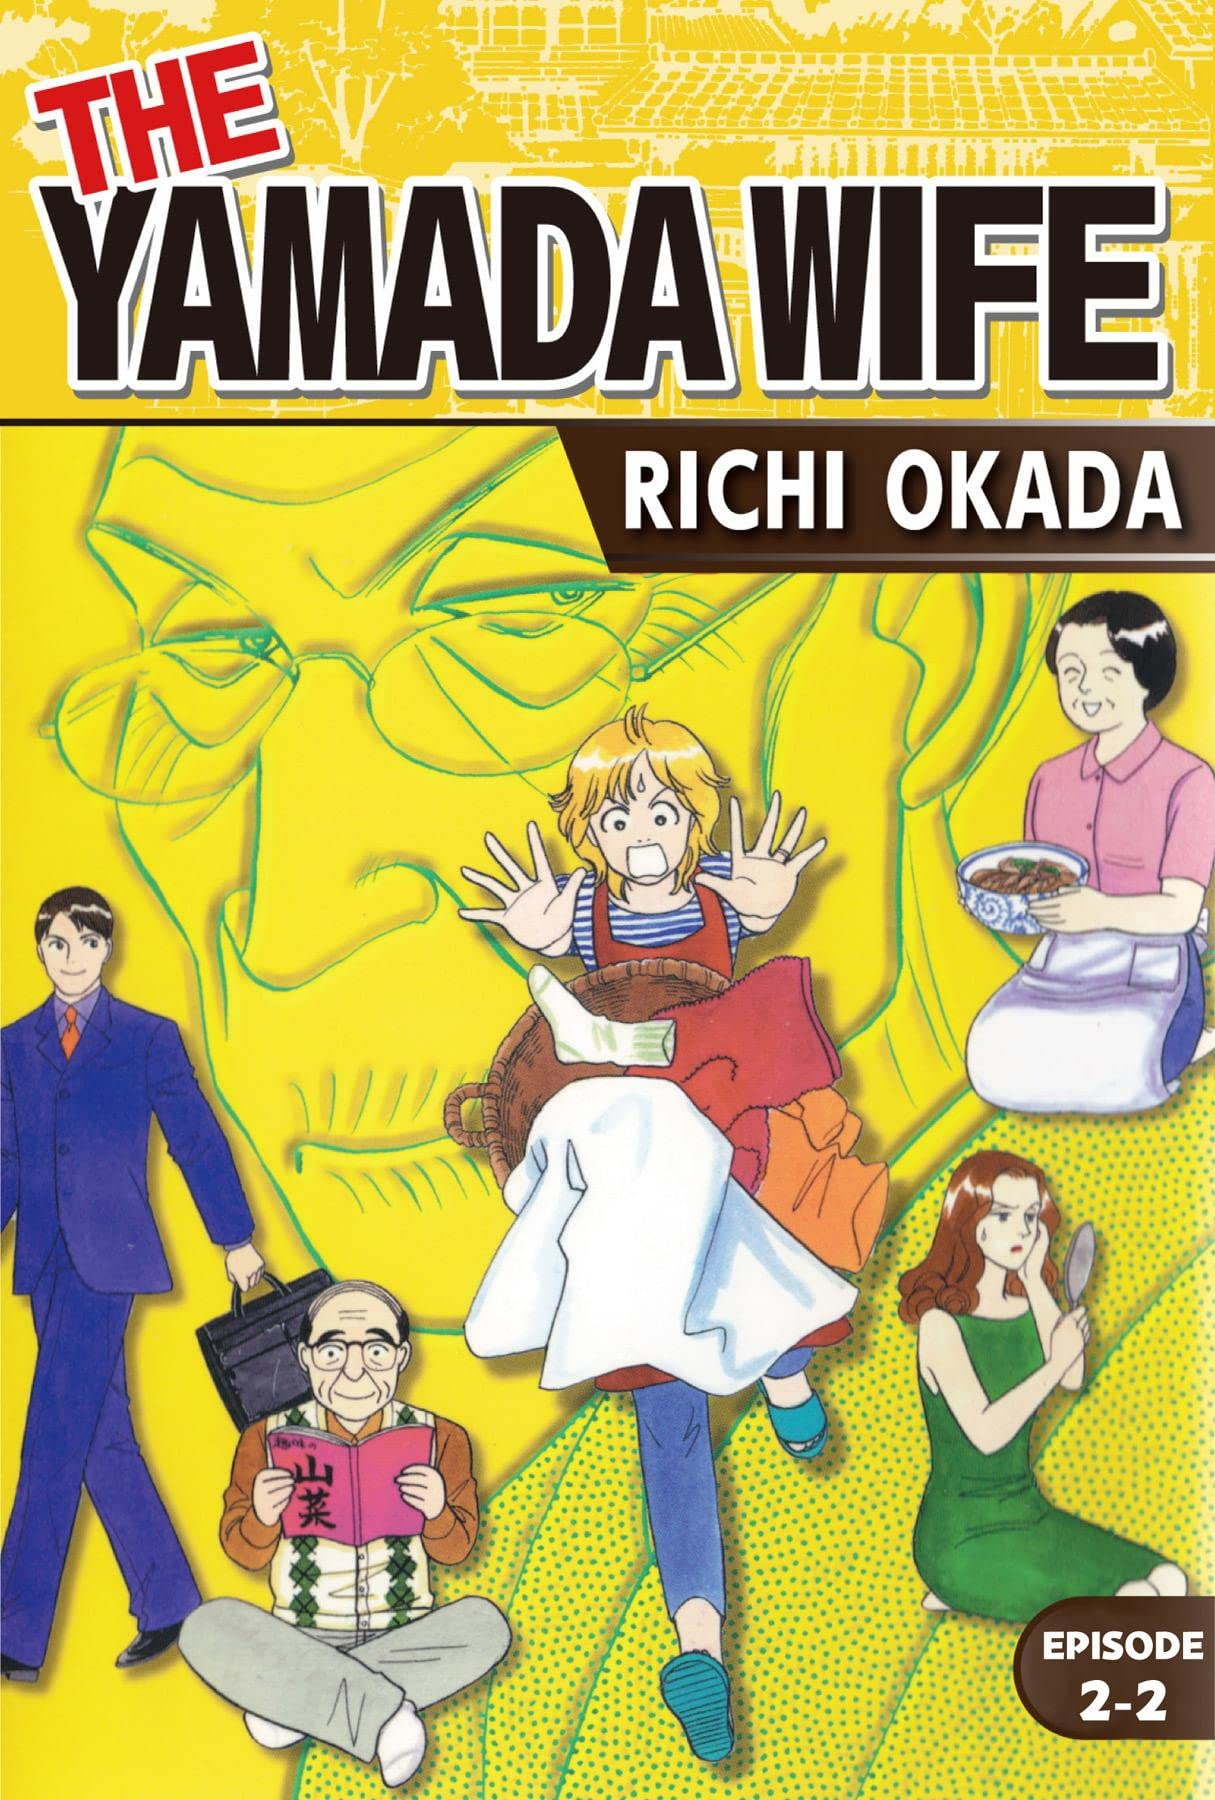 THE YAMADA WIFE #9